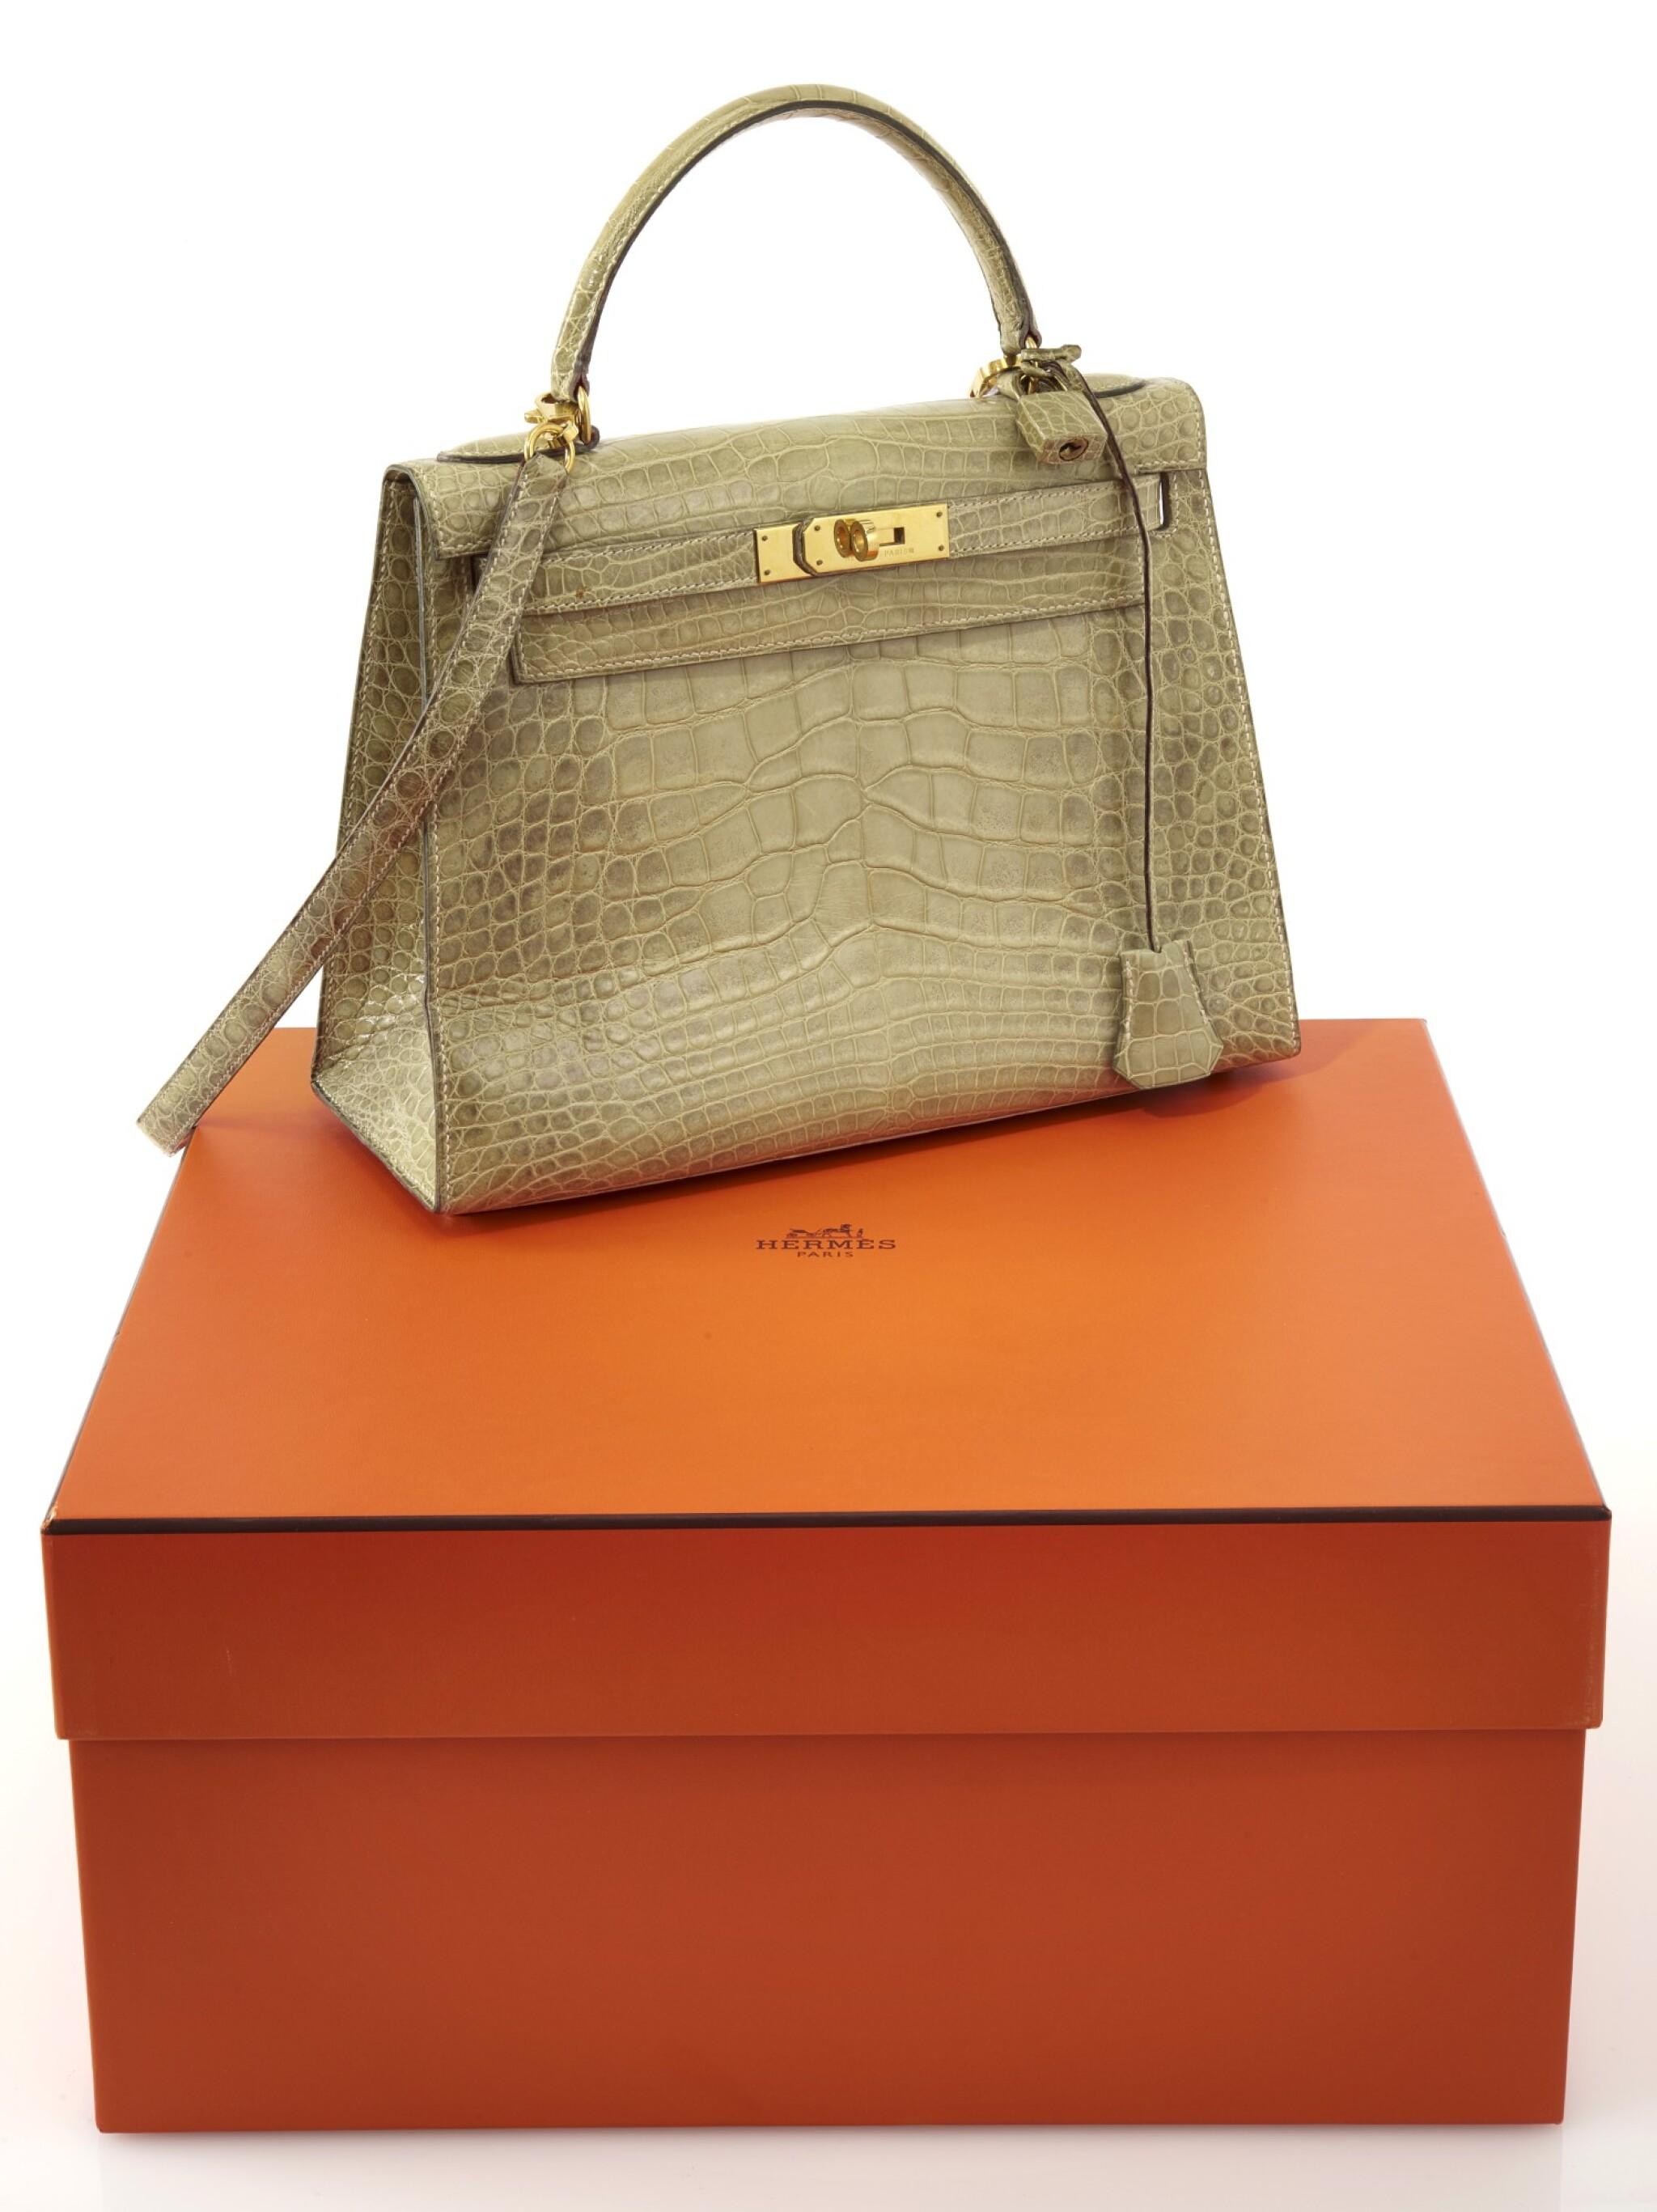 Light green alligator and gold plated hardware handbag, Kelly 29 , Hermès, 1994